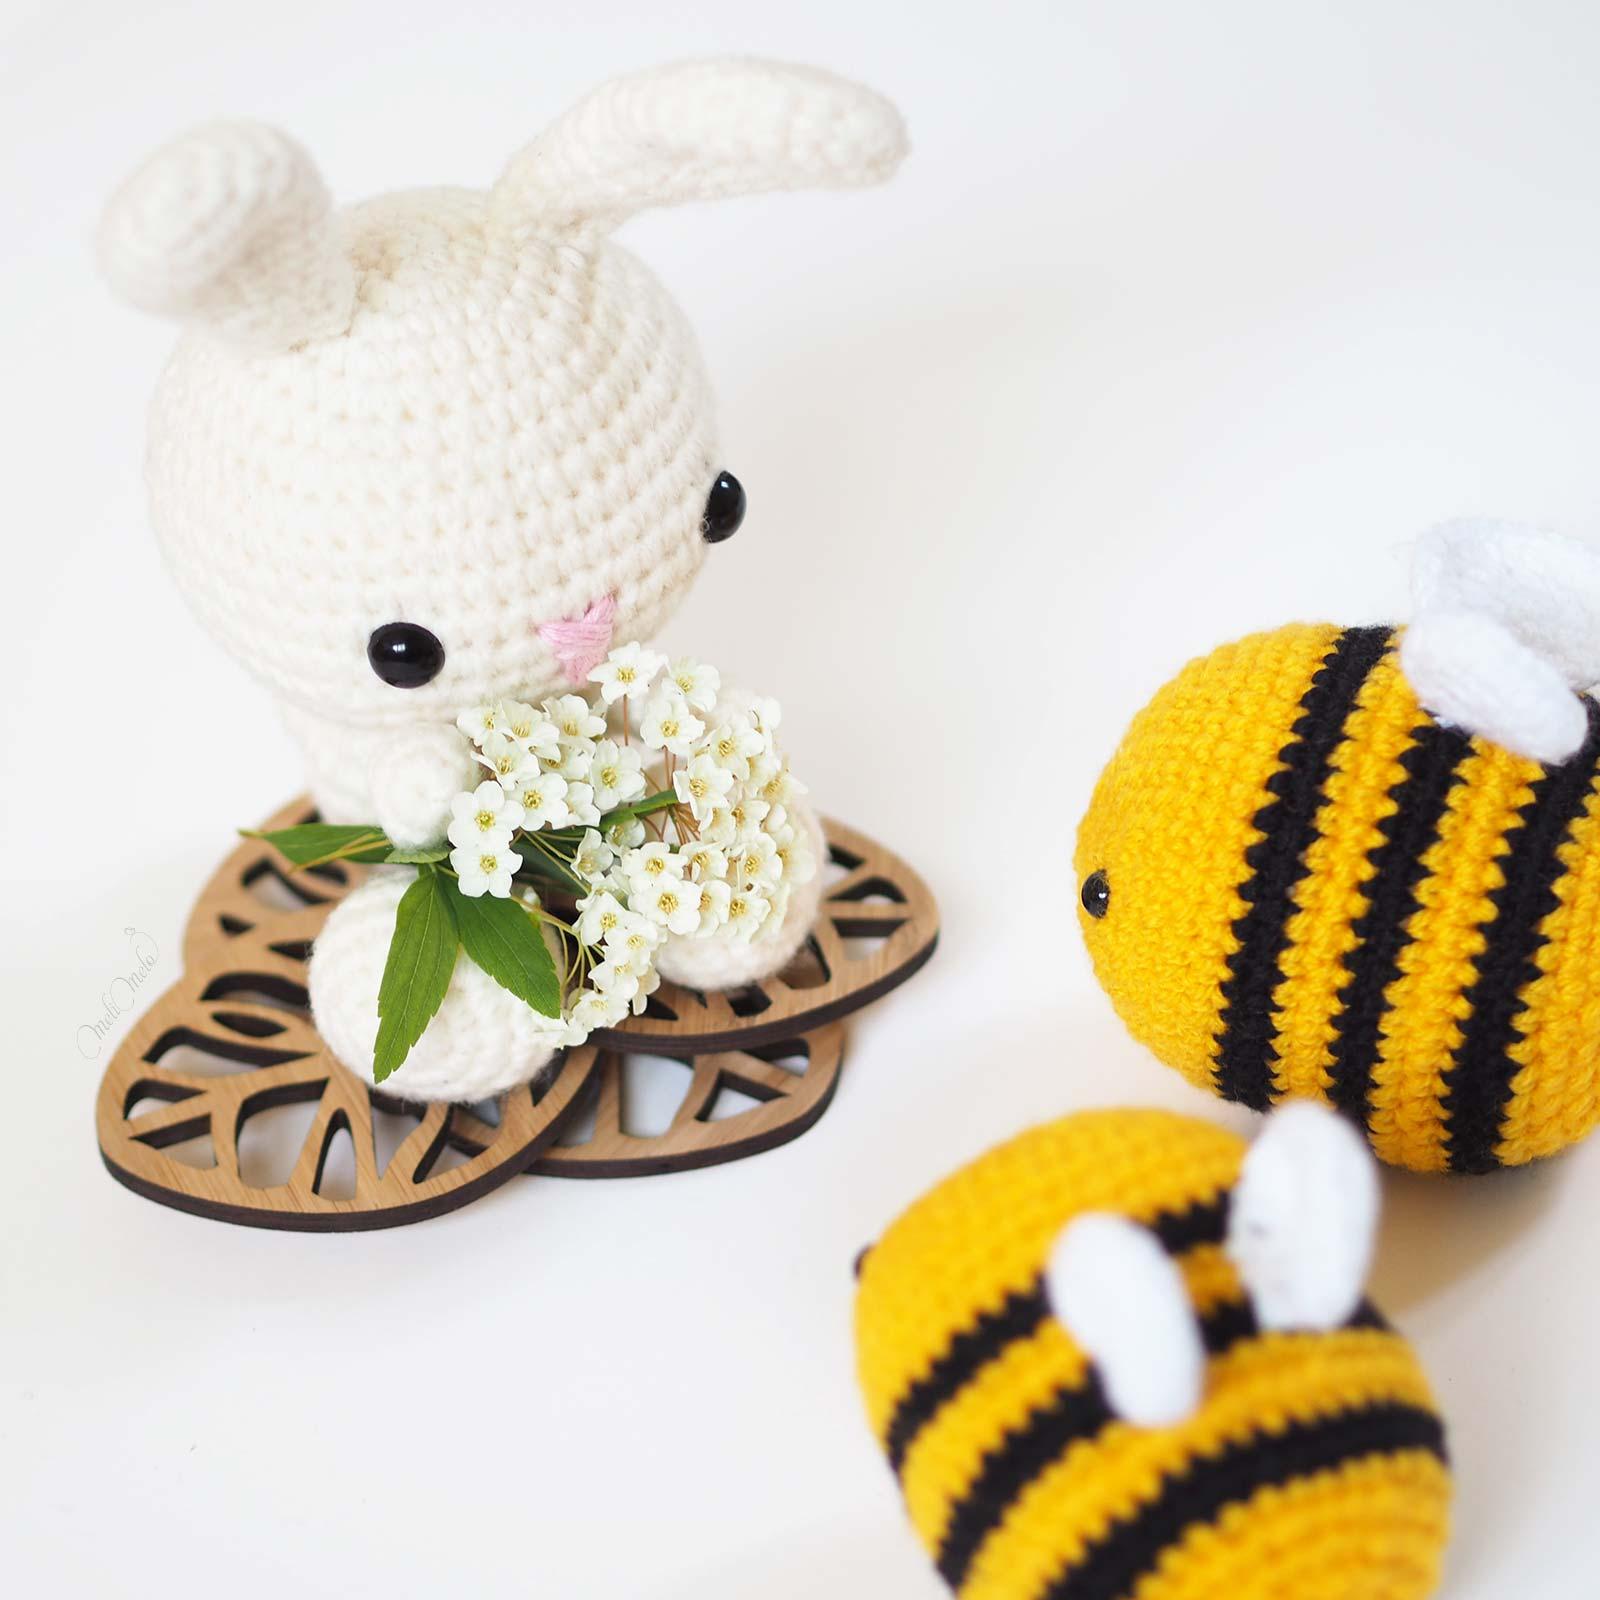 crochetbymelimelo crochet amigurumis lapin spring bunny allaboutami abeilles bees kikalite laboutiquedemelimelo